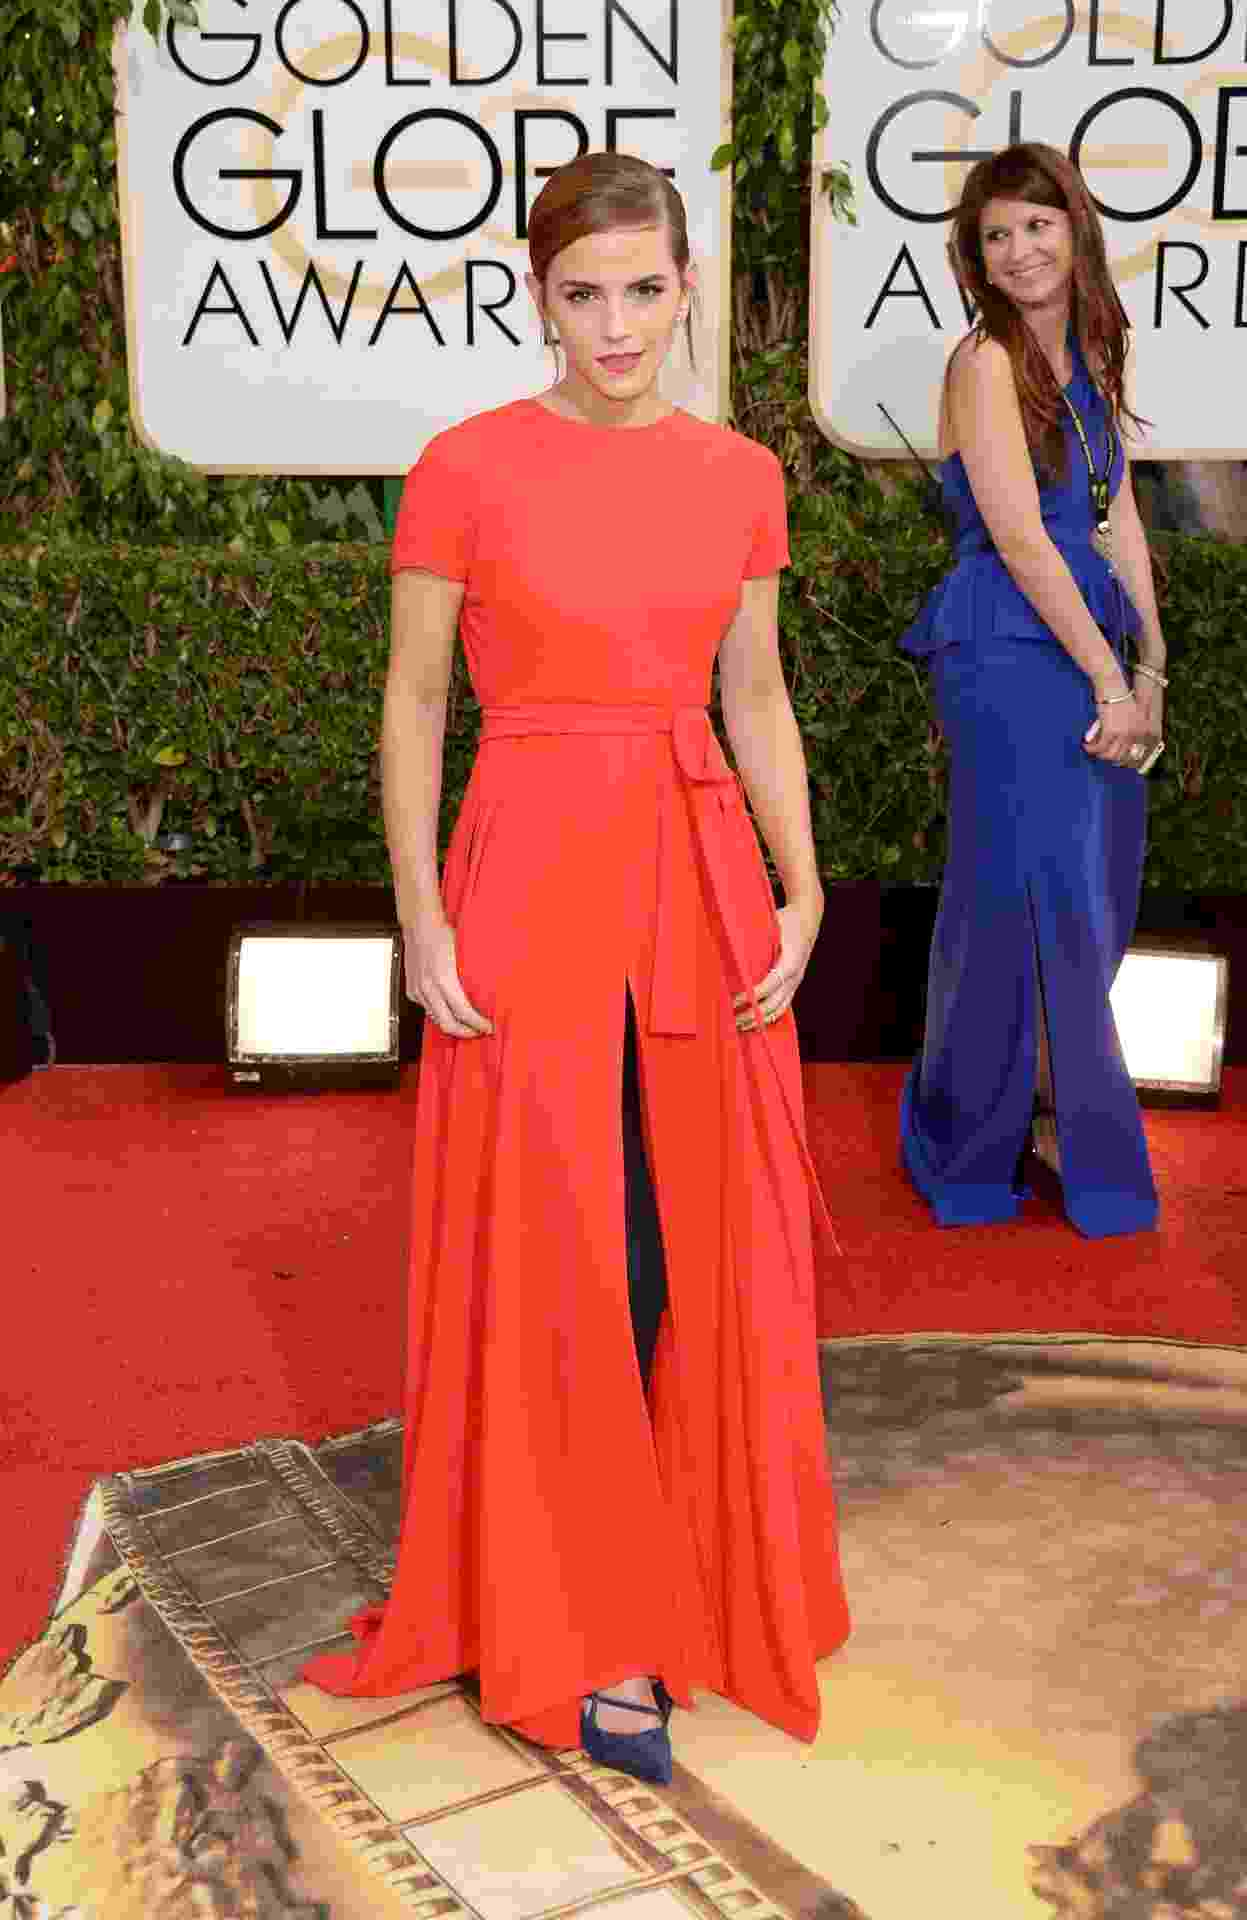 12.jan.2014 - A atriz Emma Watson posa no tapete vermelho do Globo de Ouro 2014, em Beverly Hills - Jason Merritt/Getty Images